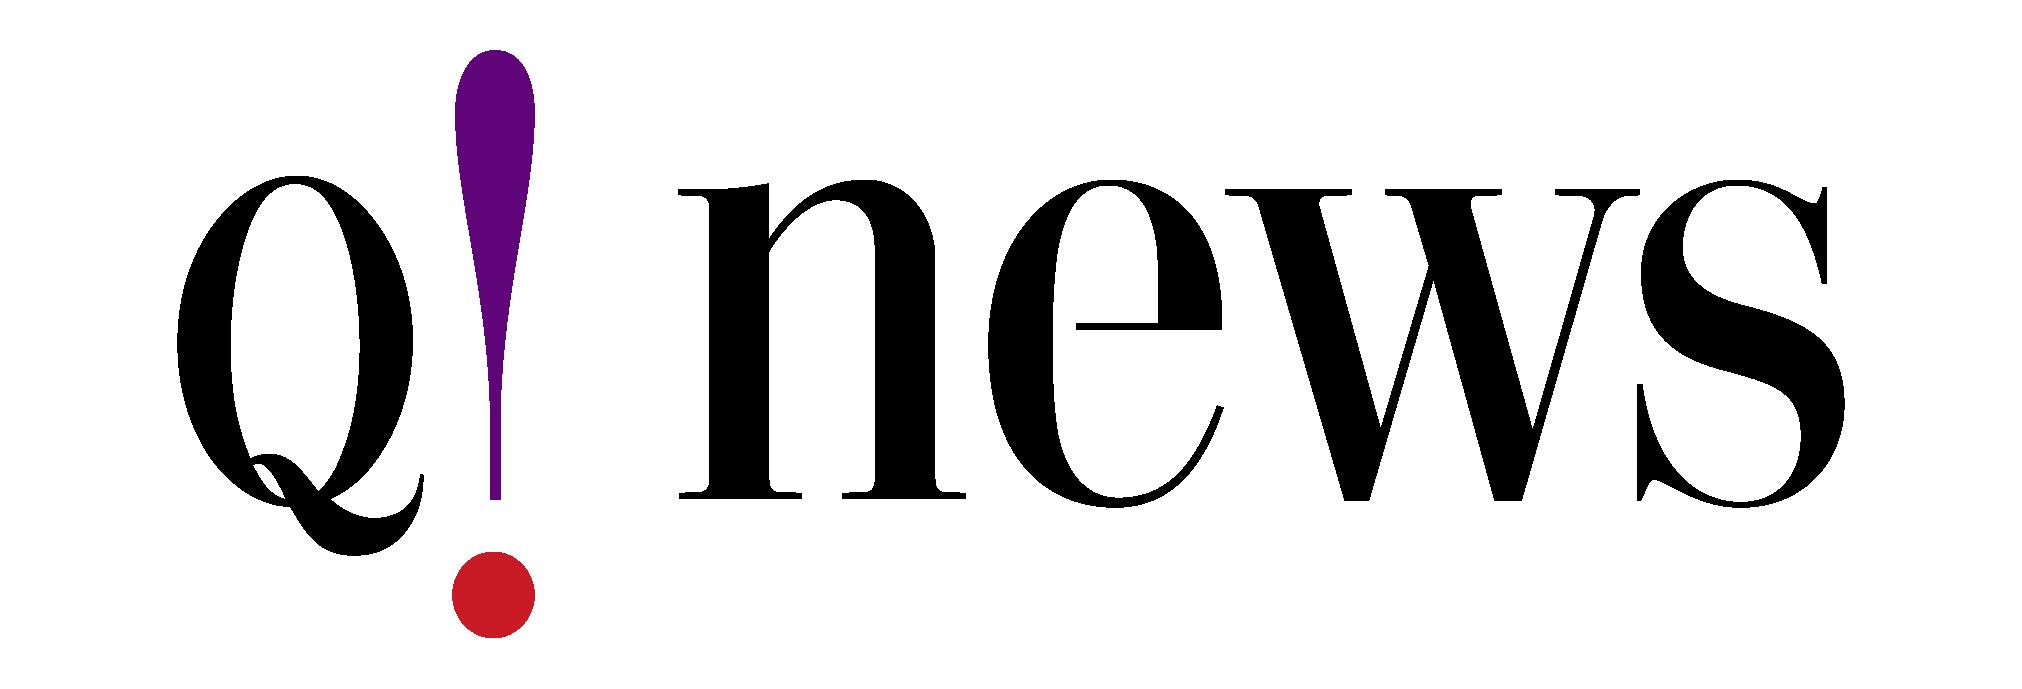 Q!News Logo